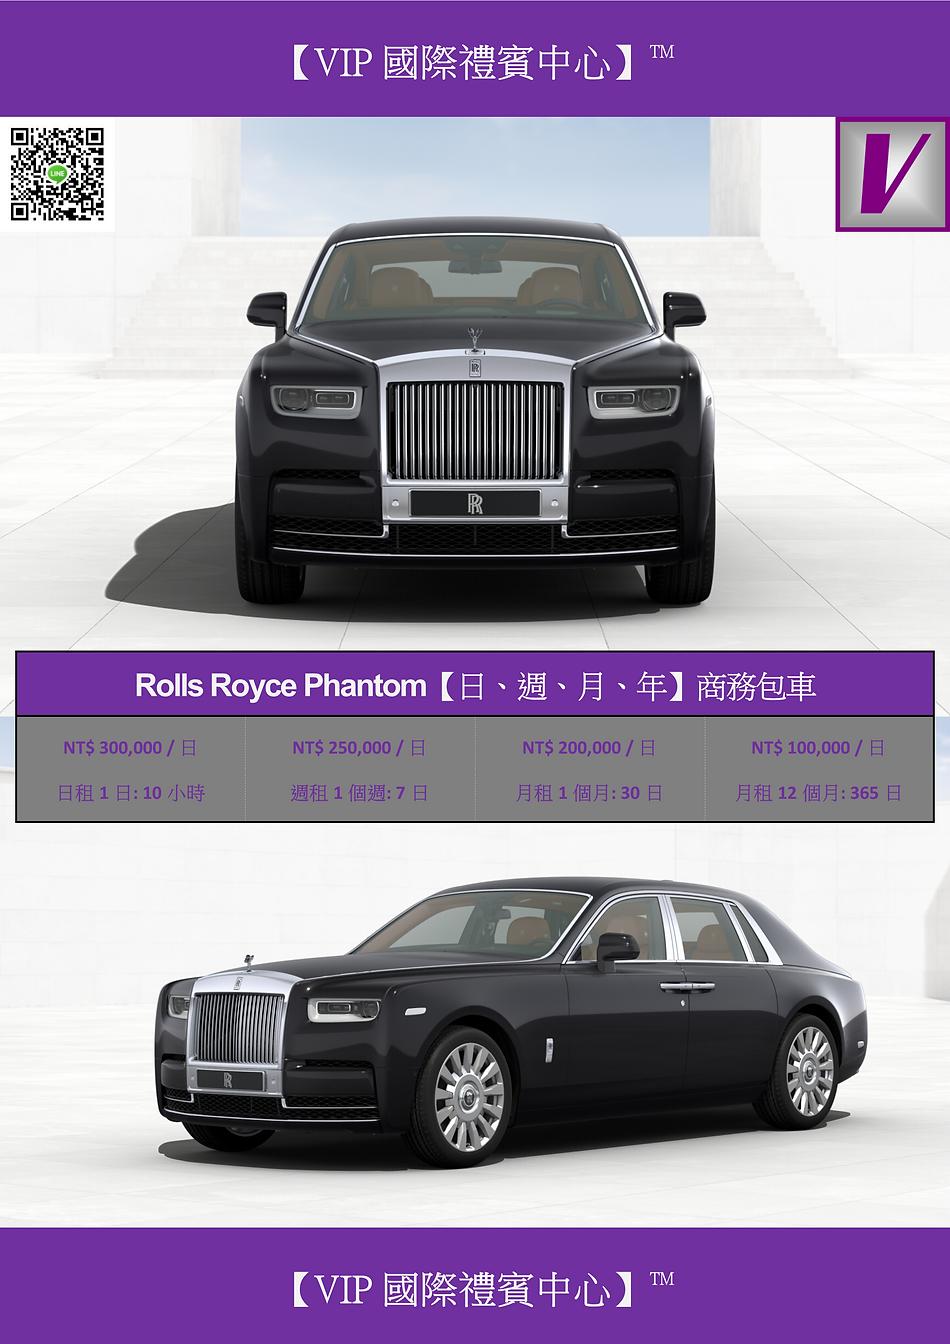 VIP國際禮賓中心 ROLLS ROYCE PHANTOM 中國臺灣接送包車